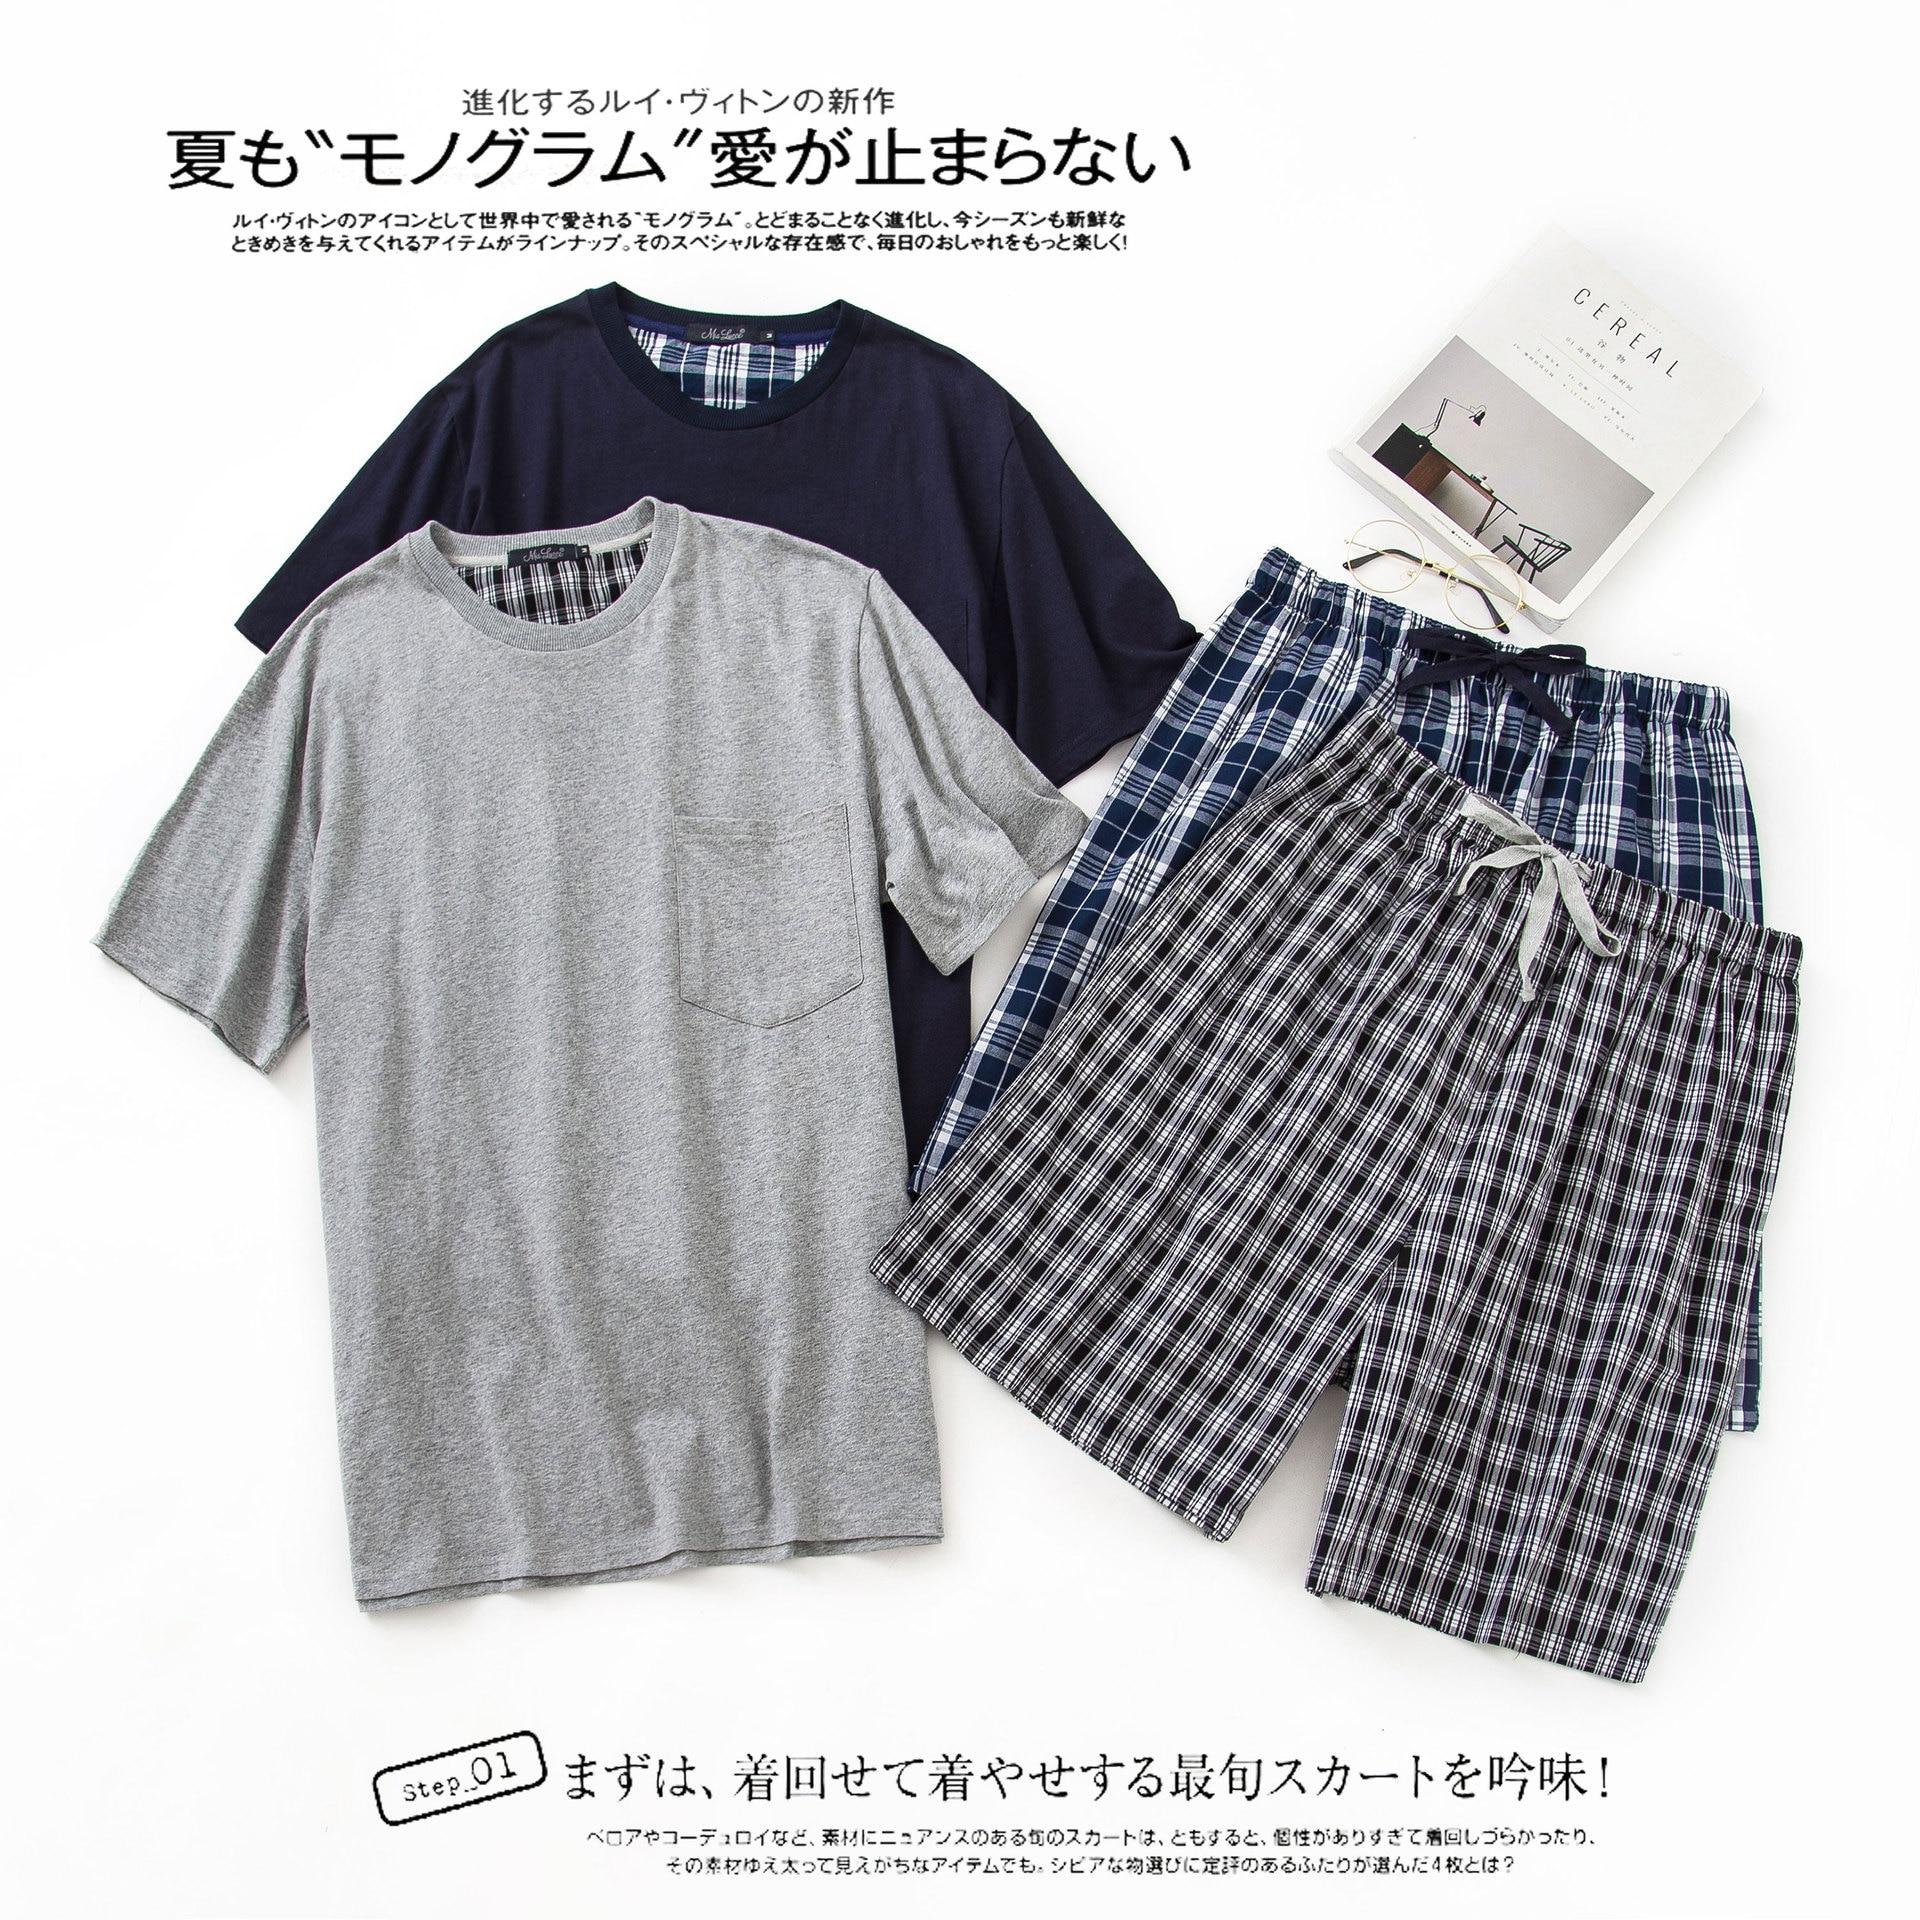 New O-Neck Cotton Mens Summer Woven Short Sleeve Shorts Pajamas Set Men Pijamas Big Size Plaid Sleepwear Leisure Suits Nightwear